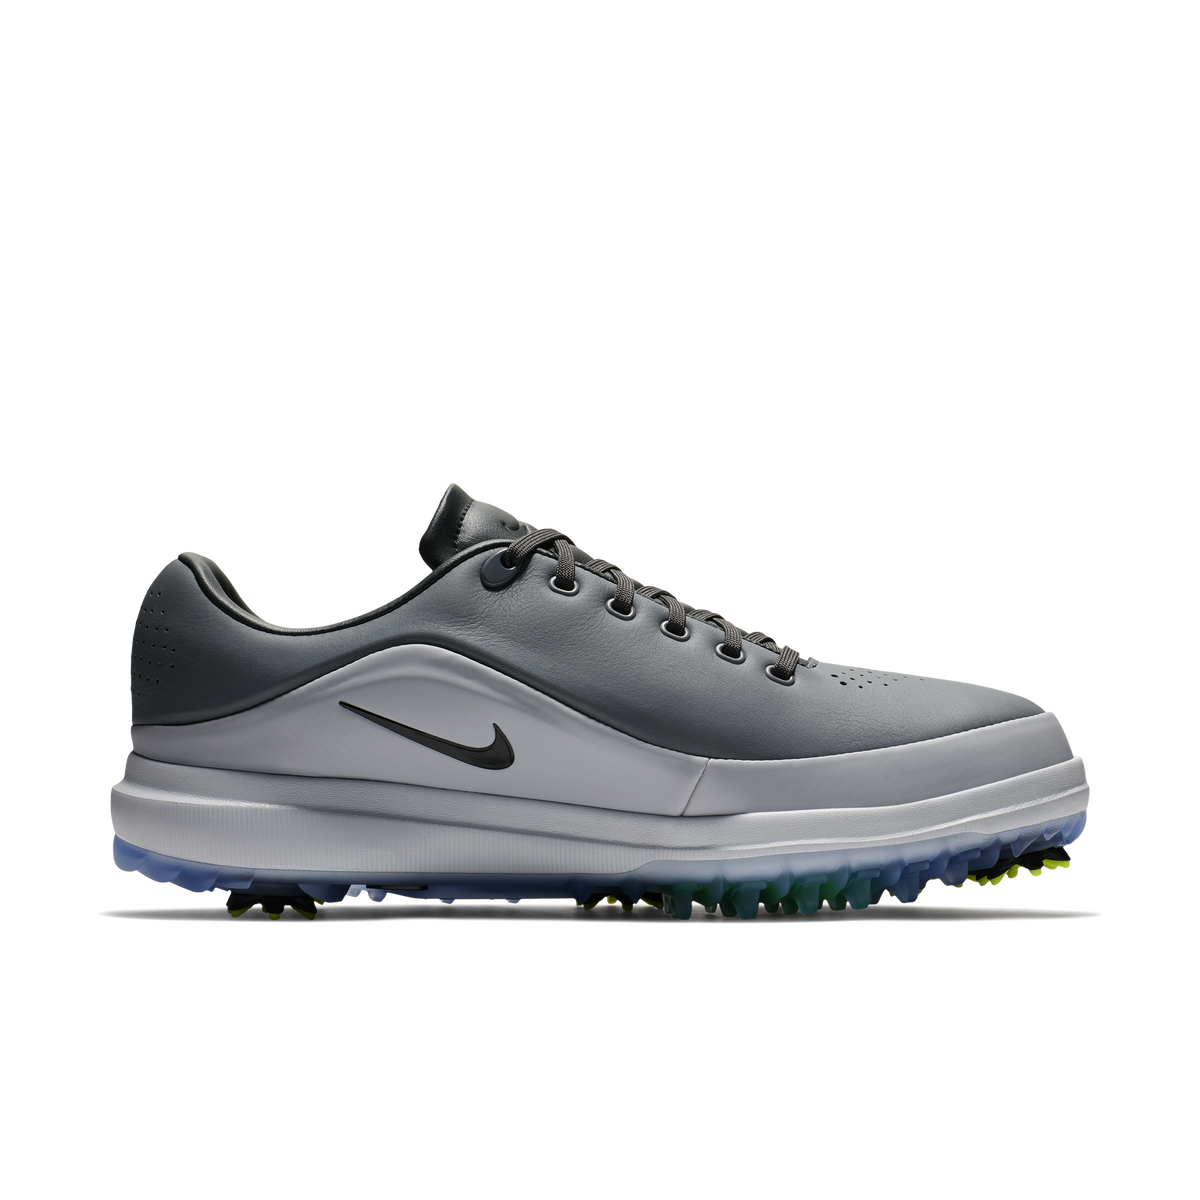 f64a8a501224 Nike Air Zoom Precision Men s Golf Shoe - Grey Black